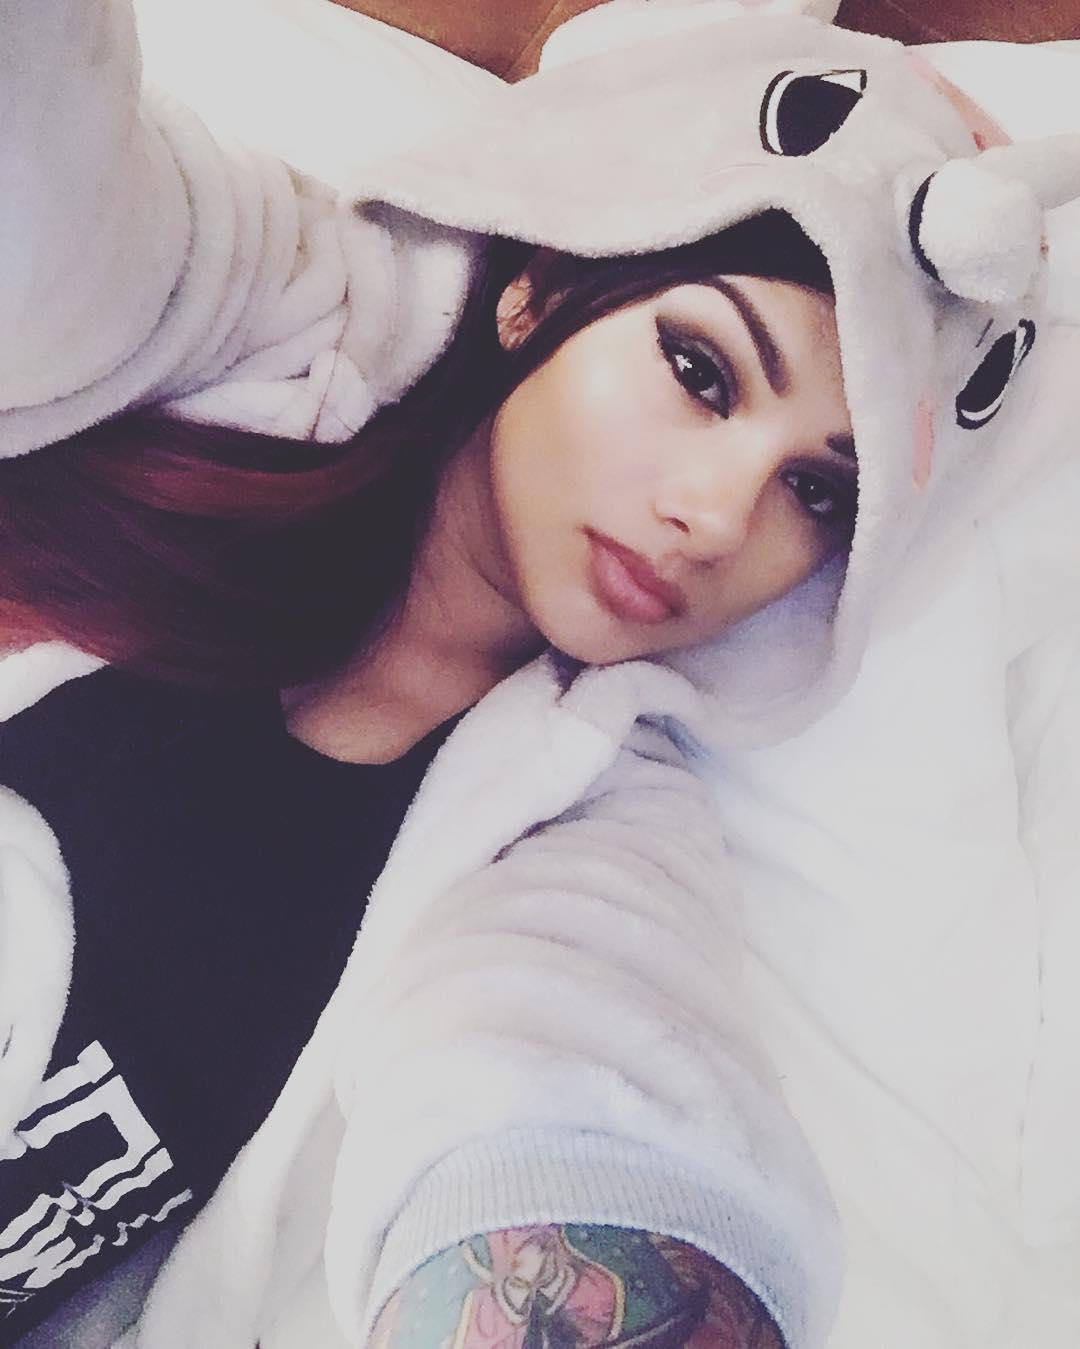 Snow Tha instagram